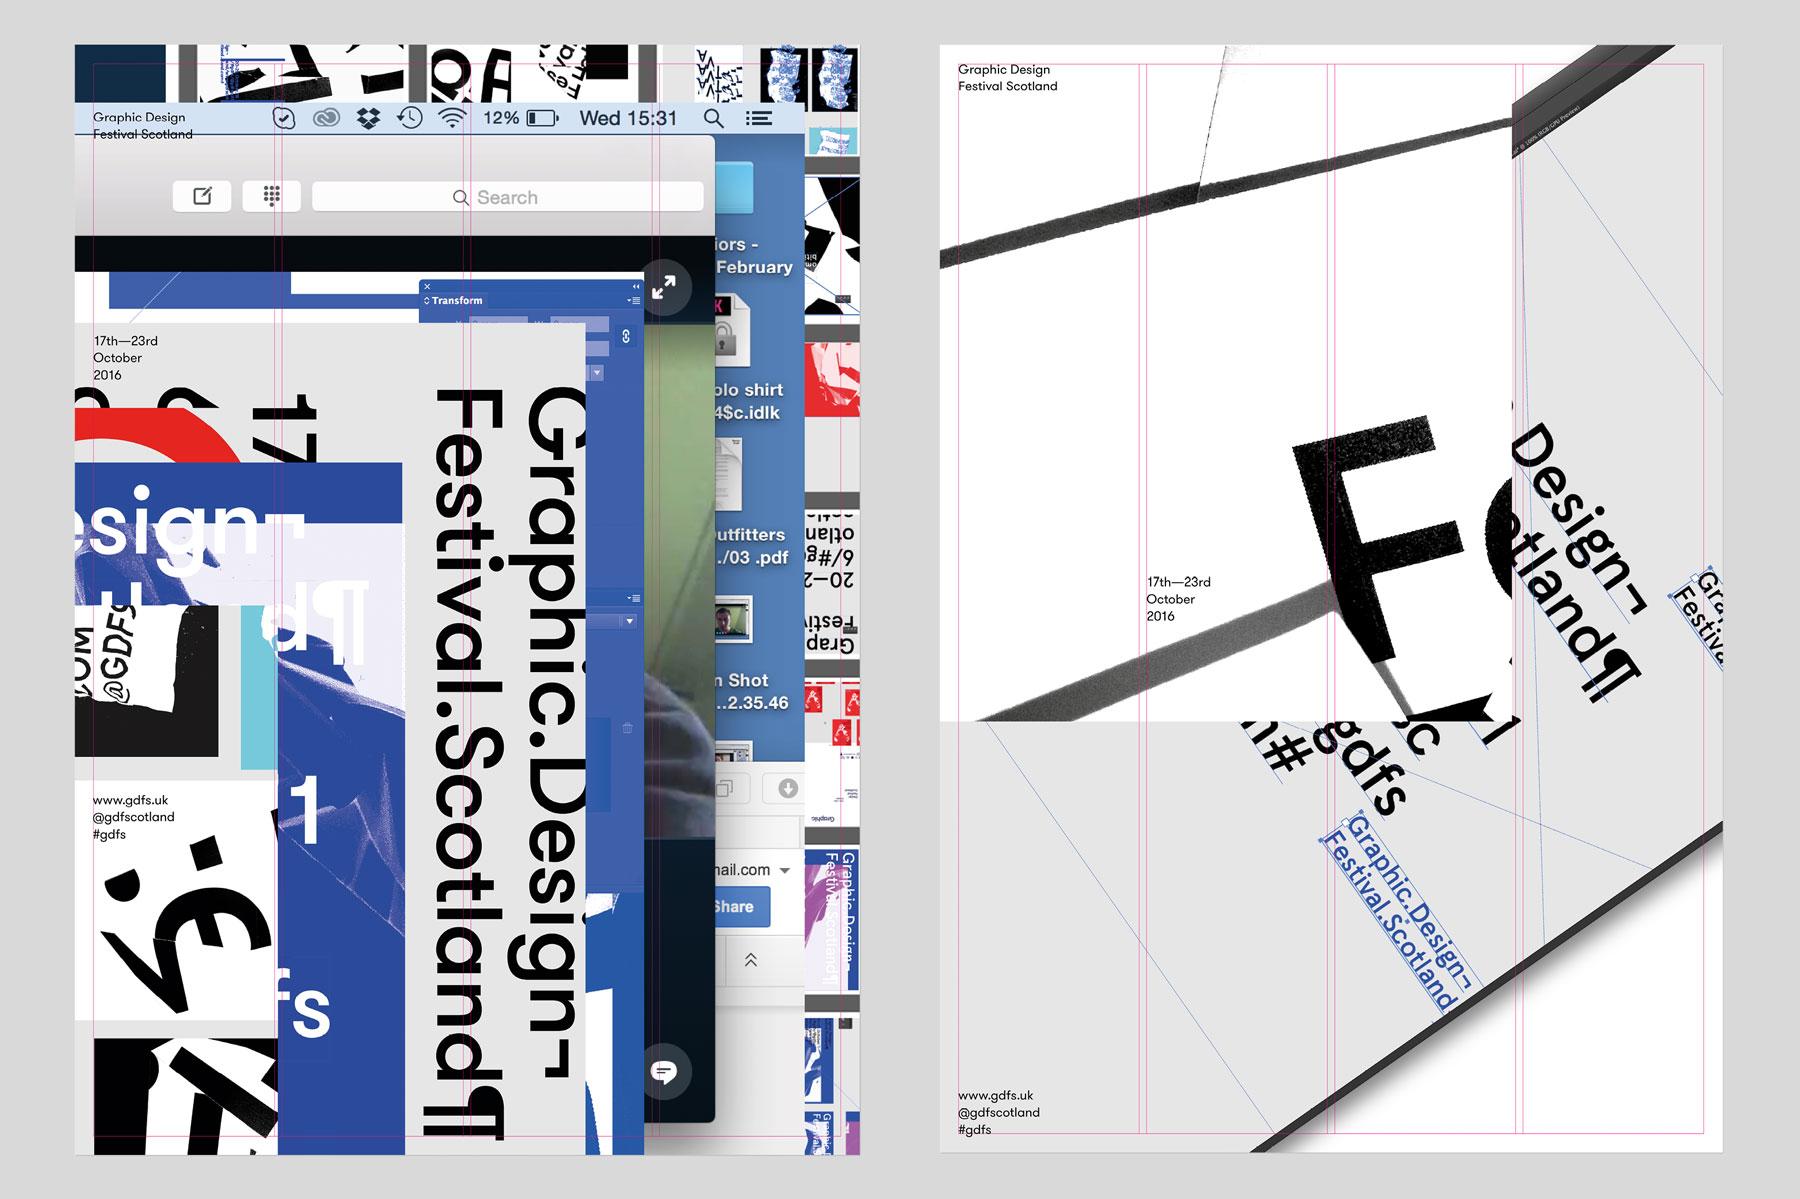 4gdfs-16-custom-identity-posters